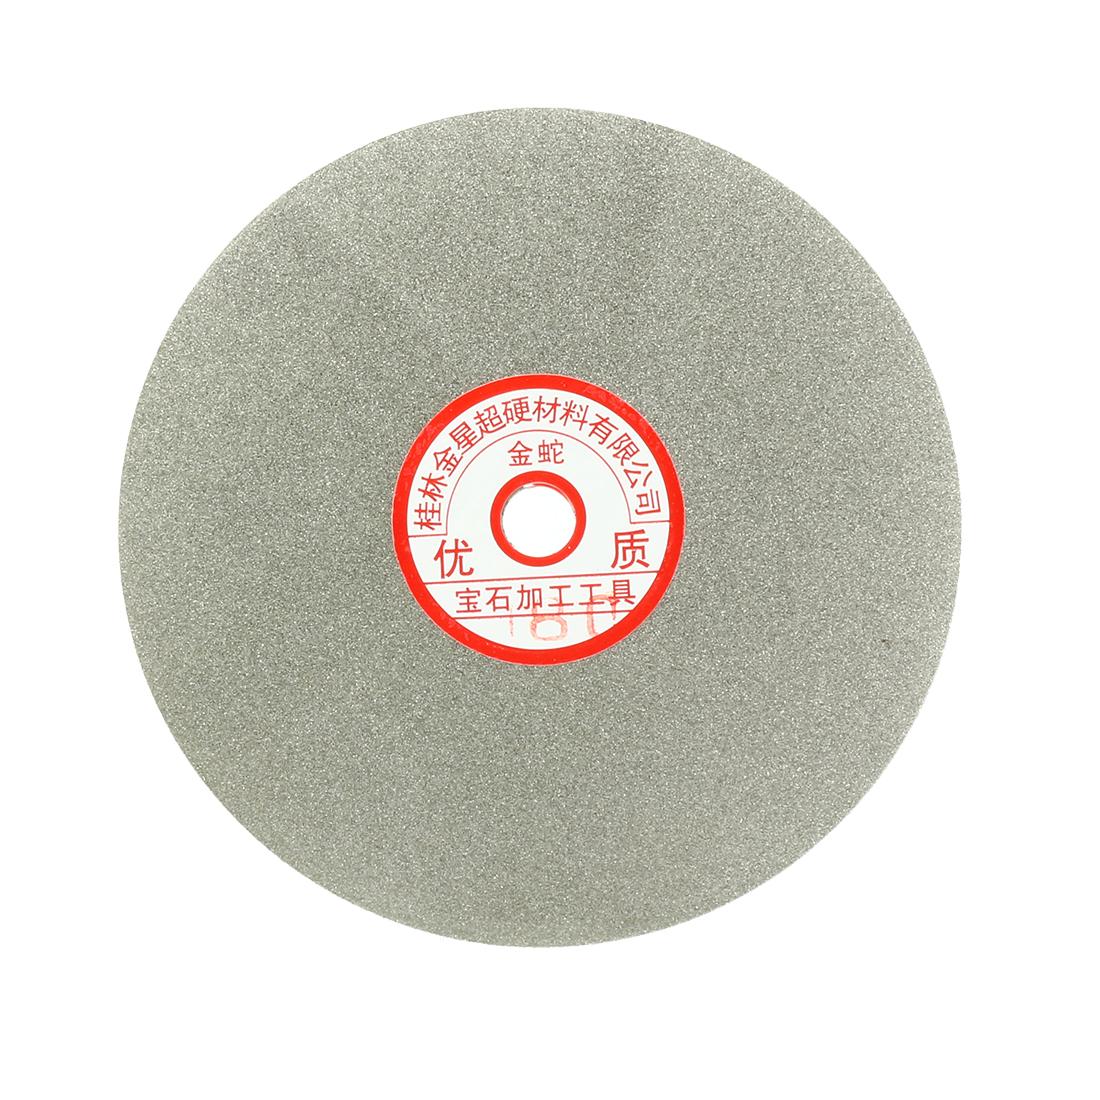 6-inch Grit 180 Diamond Coated Flat Lap Wheel Grinding Sanding Polishing Disc